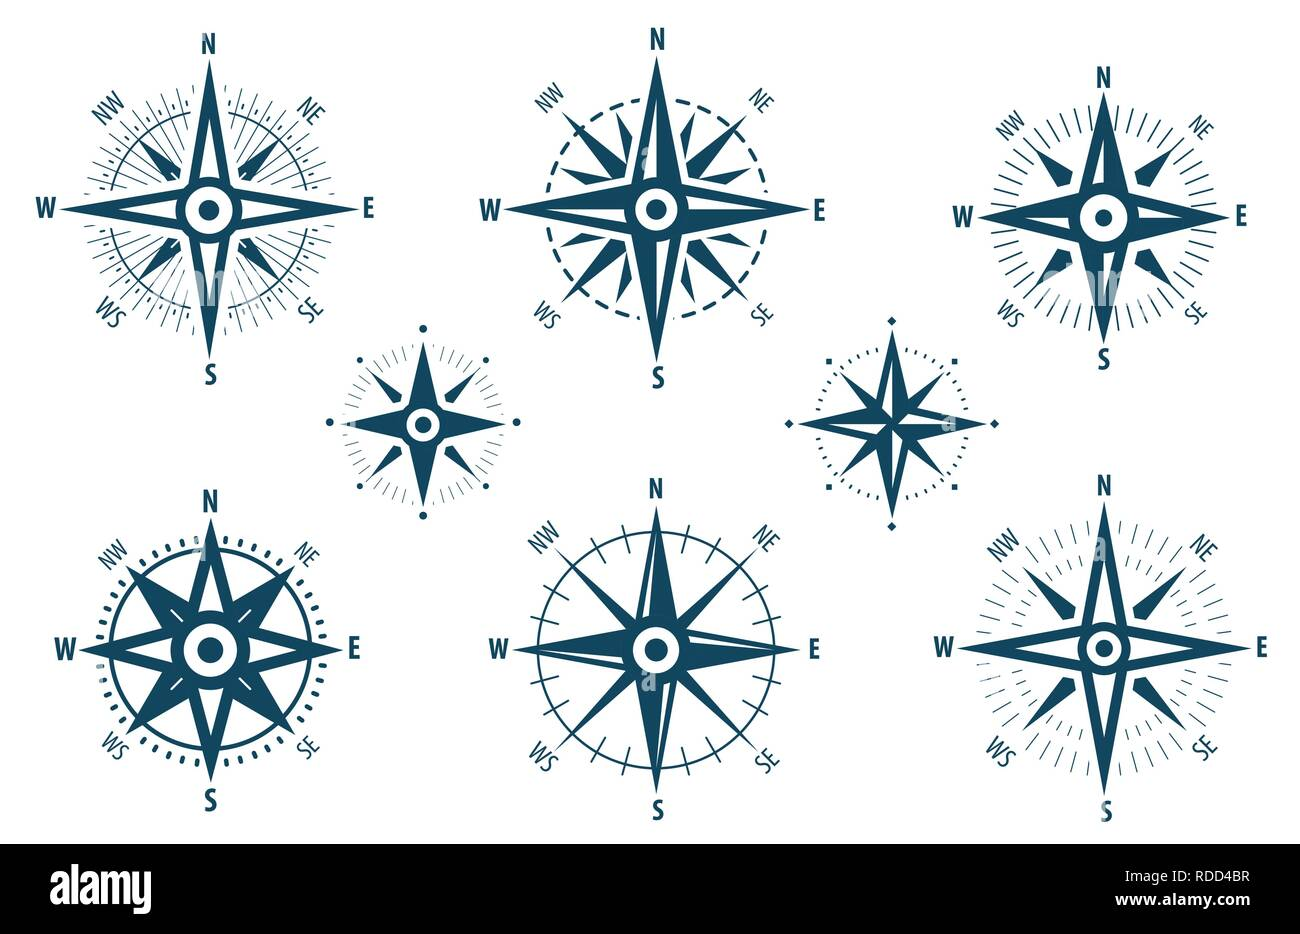 Compass icon set. Marine navigation, wind rose symbol. Vector illustration - Stock Image